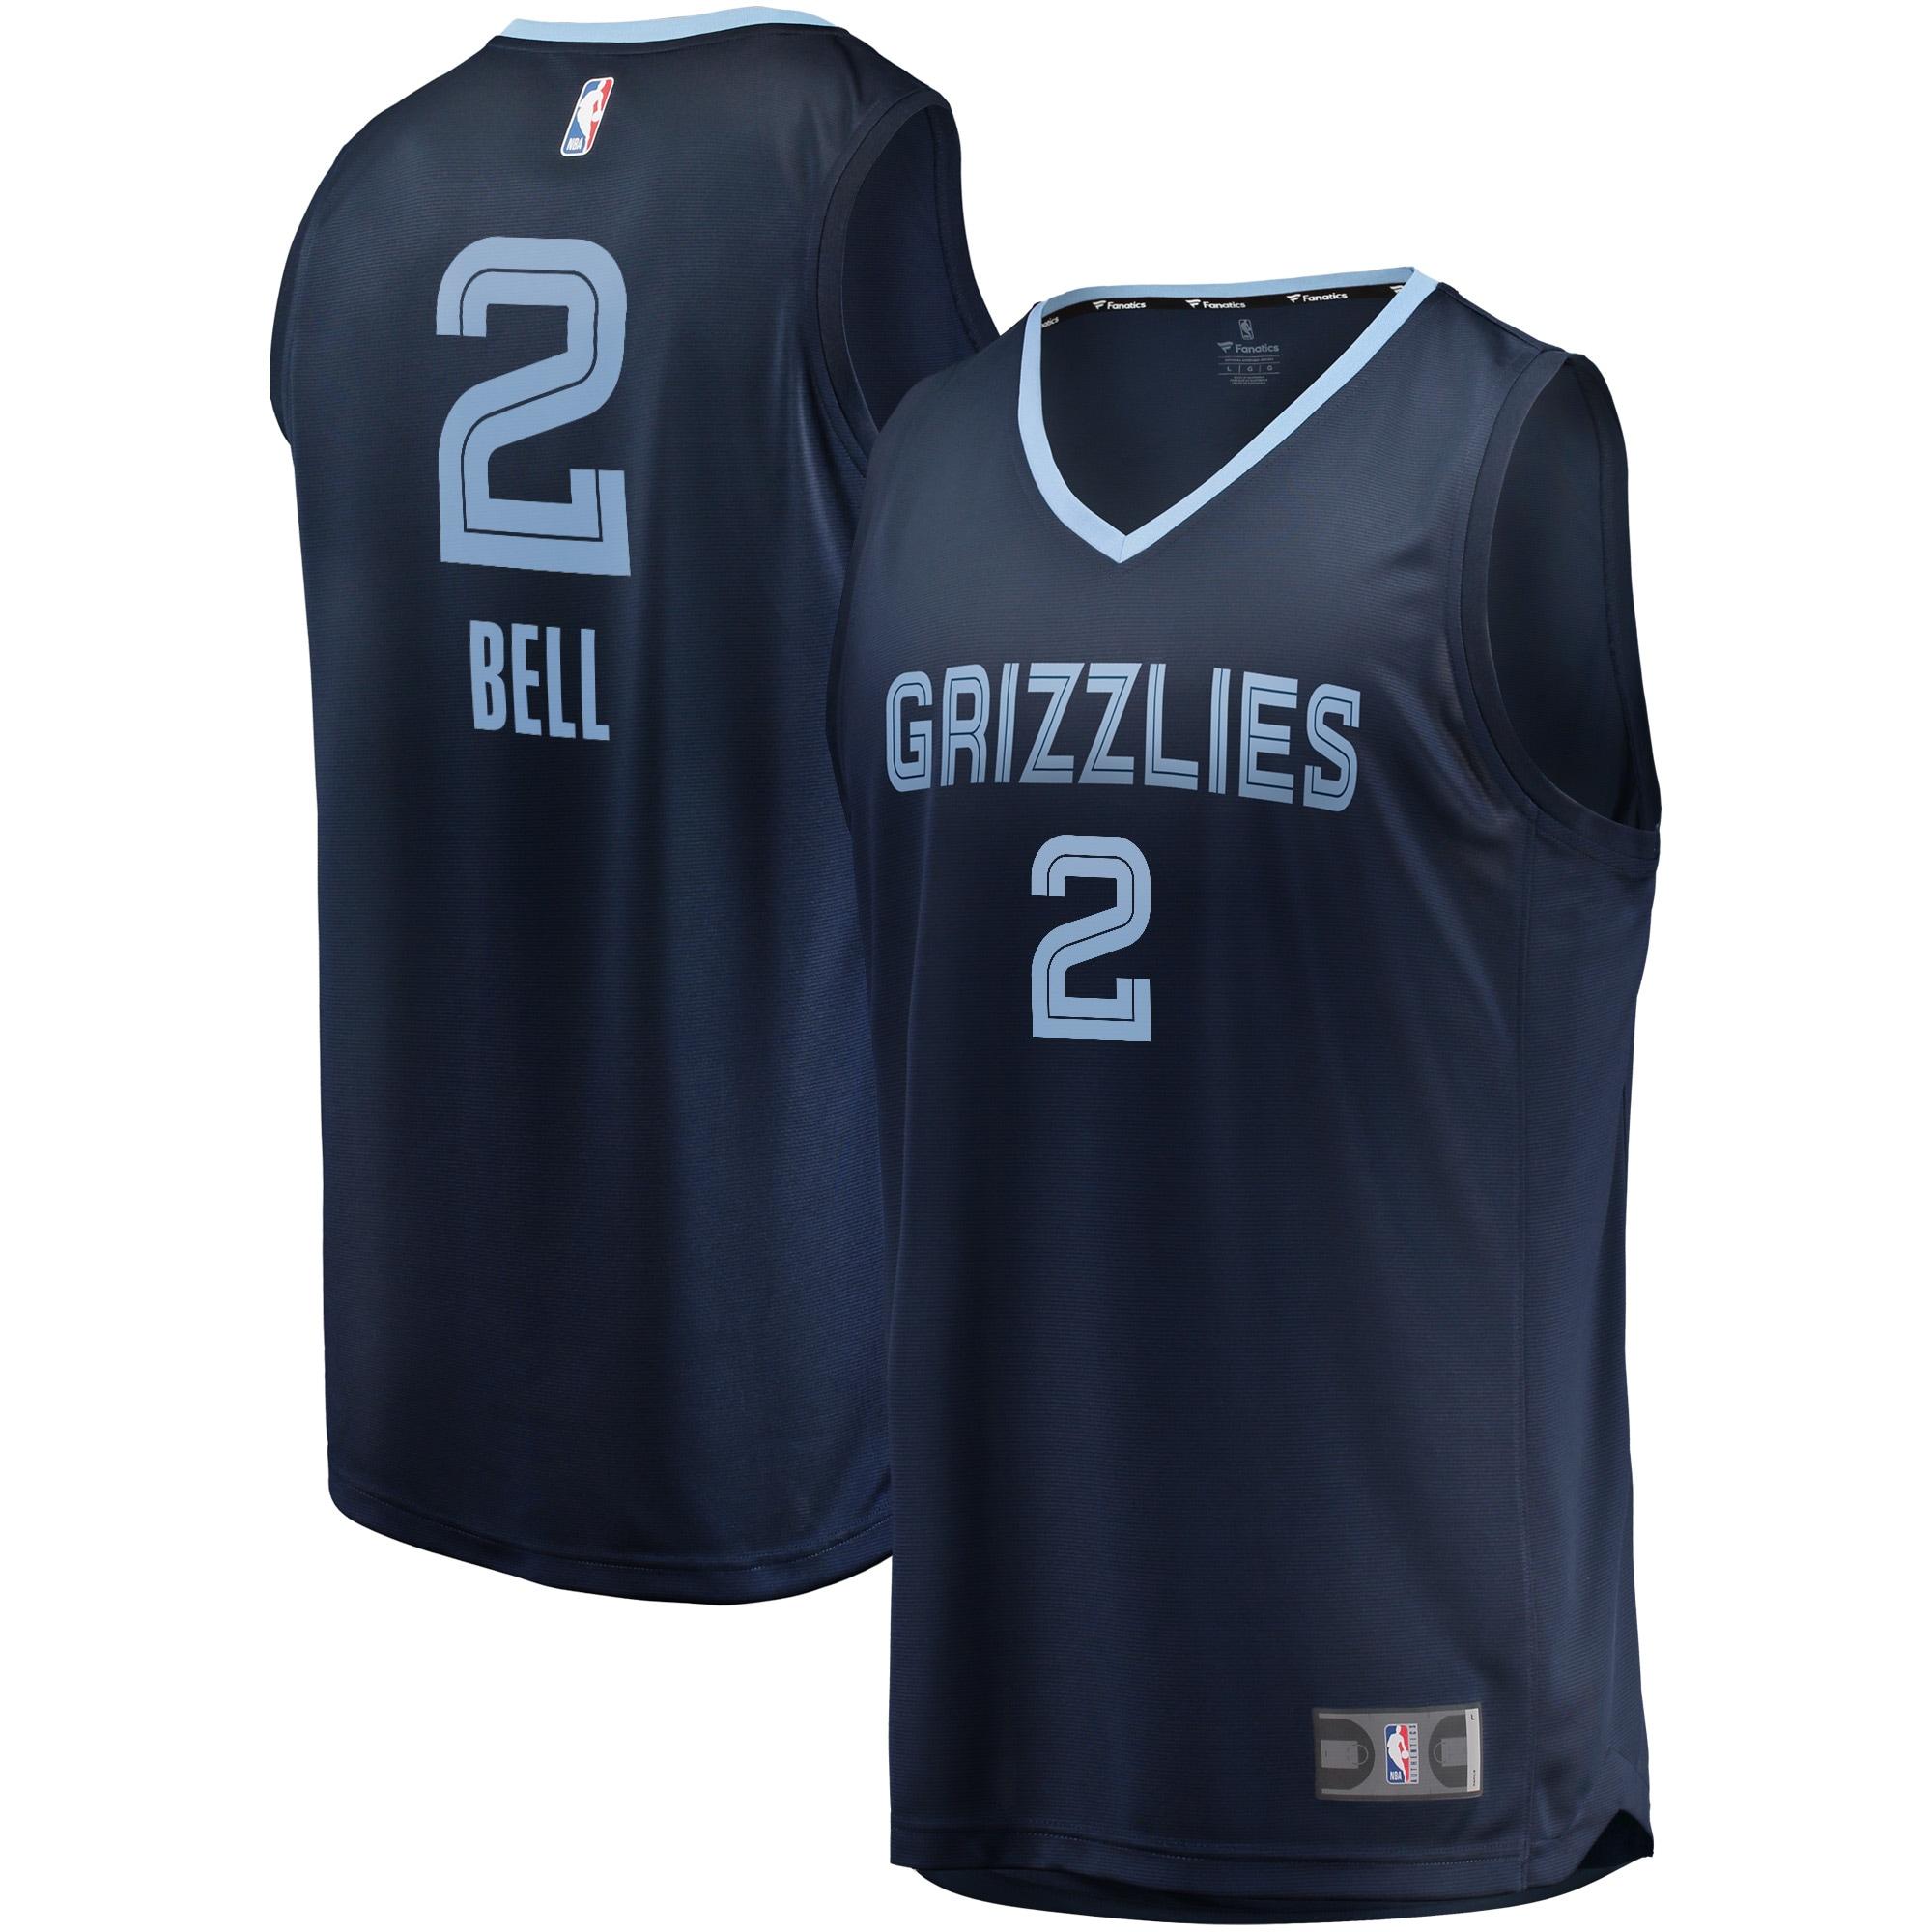 Jordan Bell Memphis Grizzlies Fanatics Branded Fast Break Player Jersey - Icon Edition - Navy